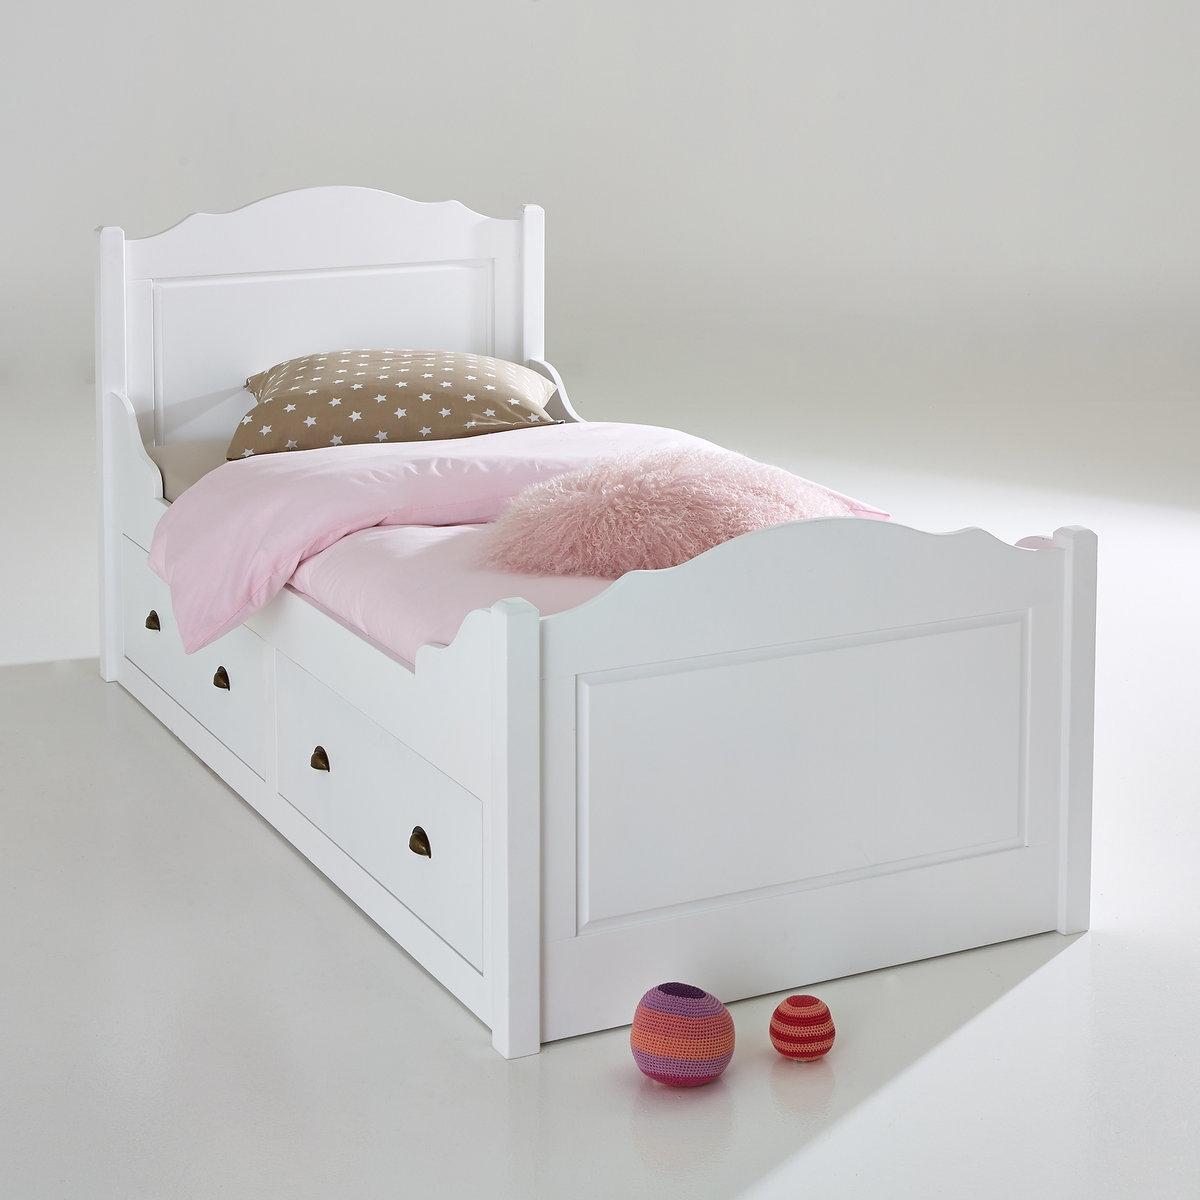 Кровать La Redoute С изогнутыми спинками и ящиками Authentic Style 90 x 190 см белый x style